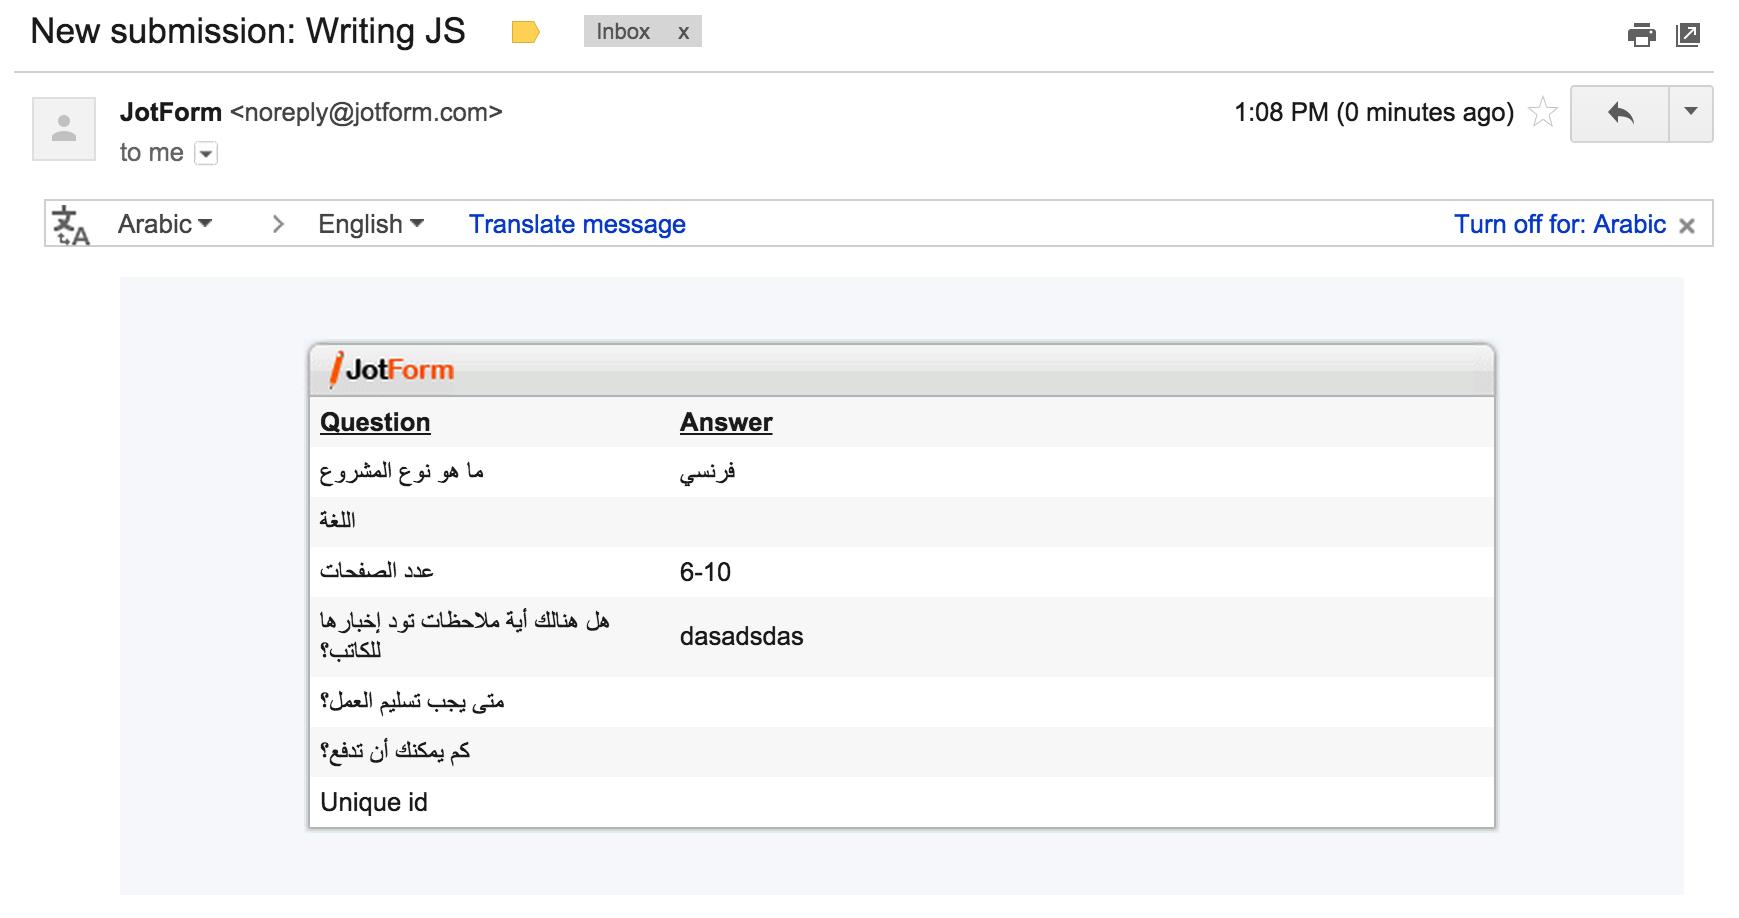 Screenshot not submitting data radio button